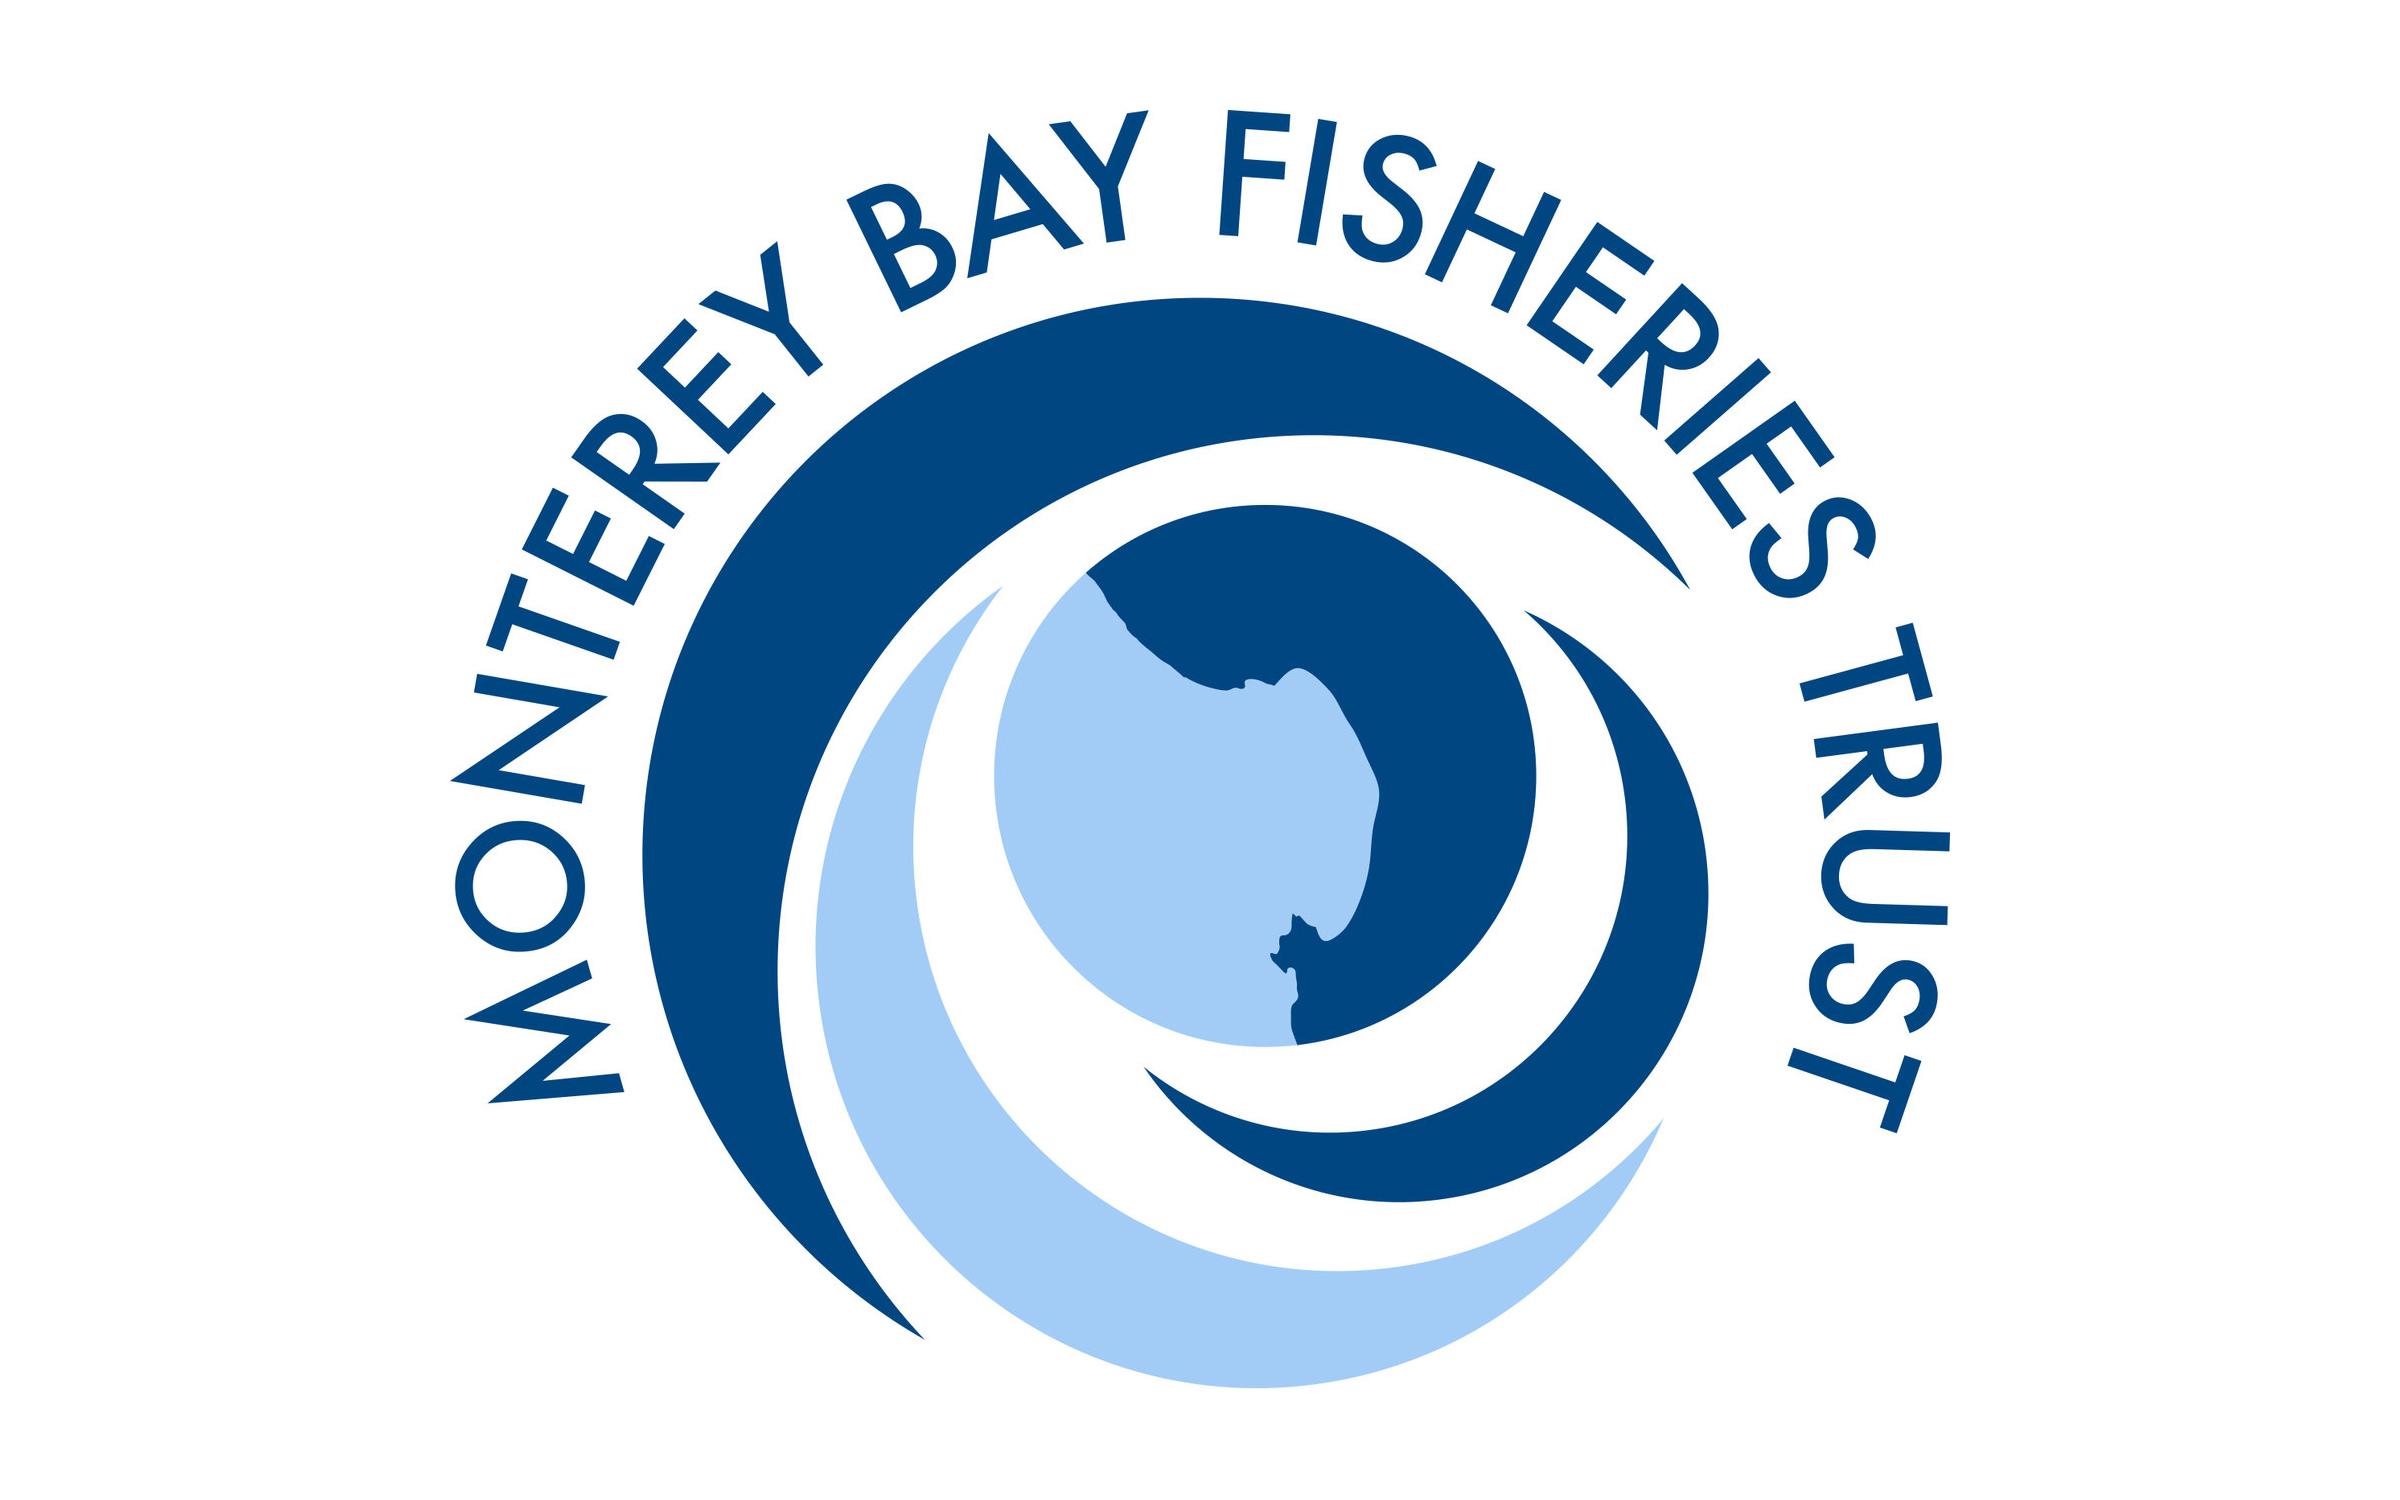 monterey bay fisheries trust